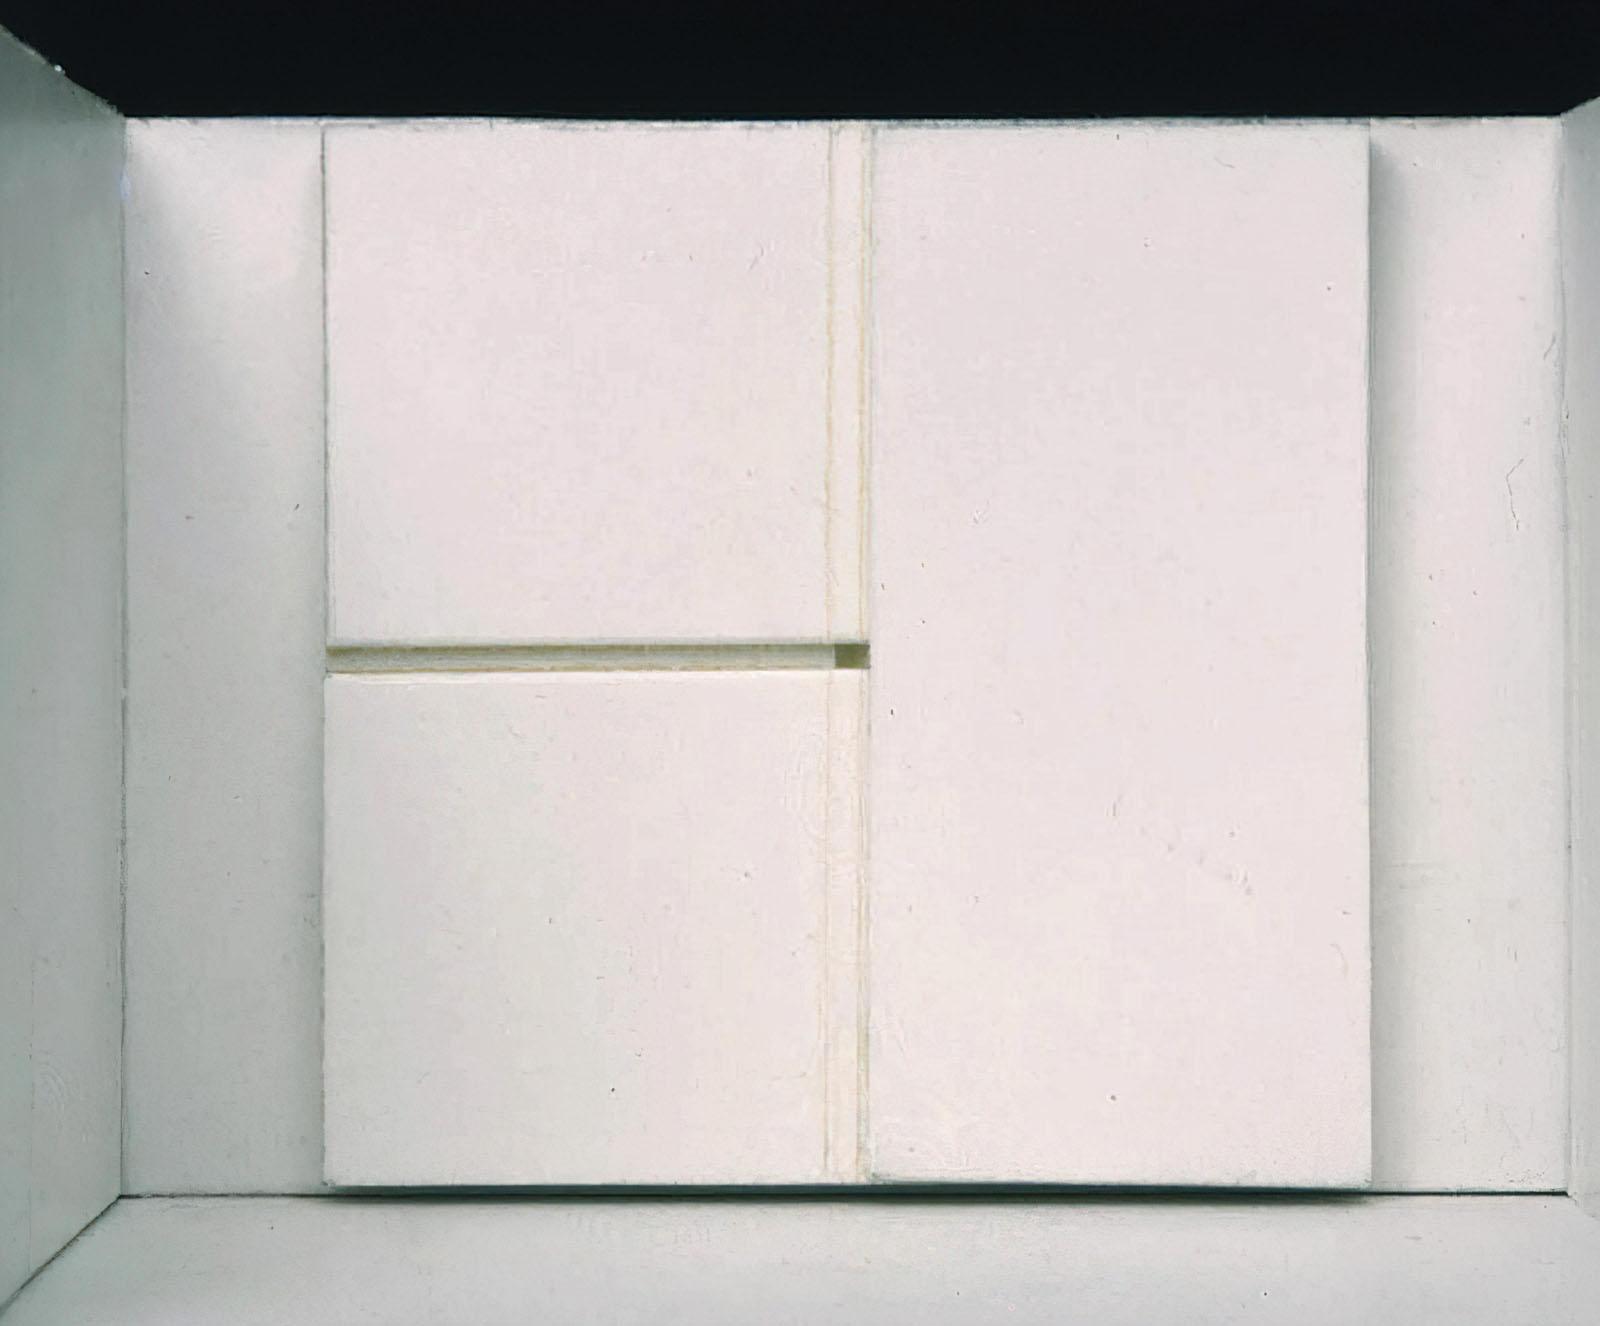 Sandro De-Alexandris - Microrelief